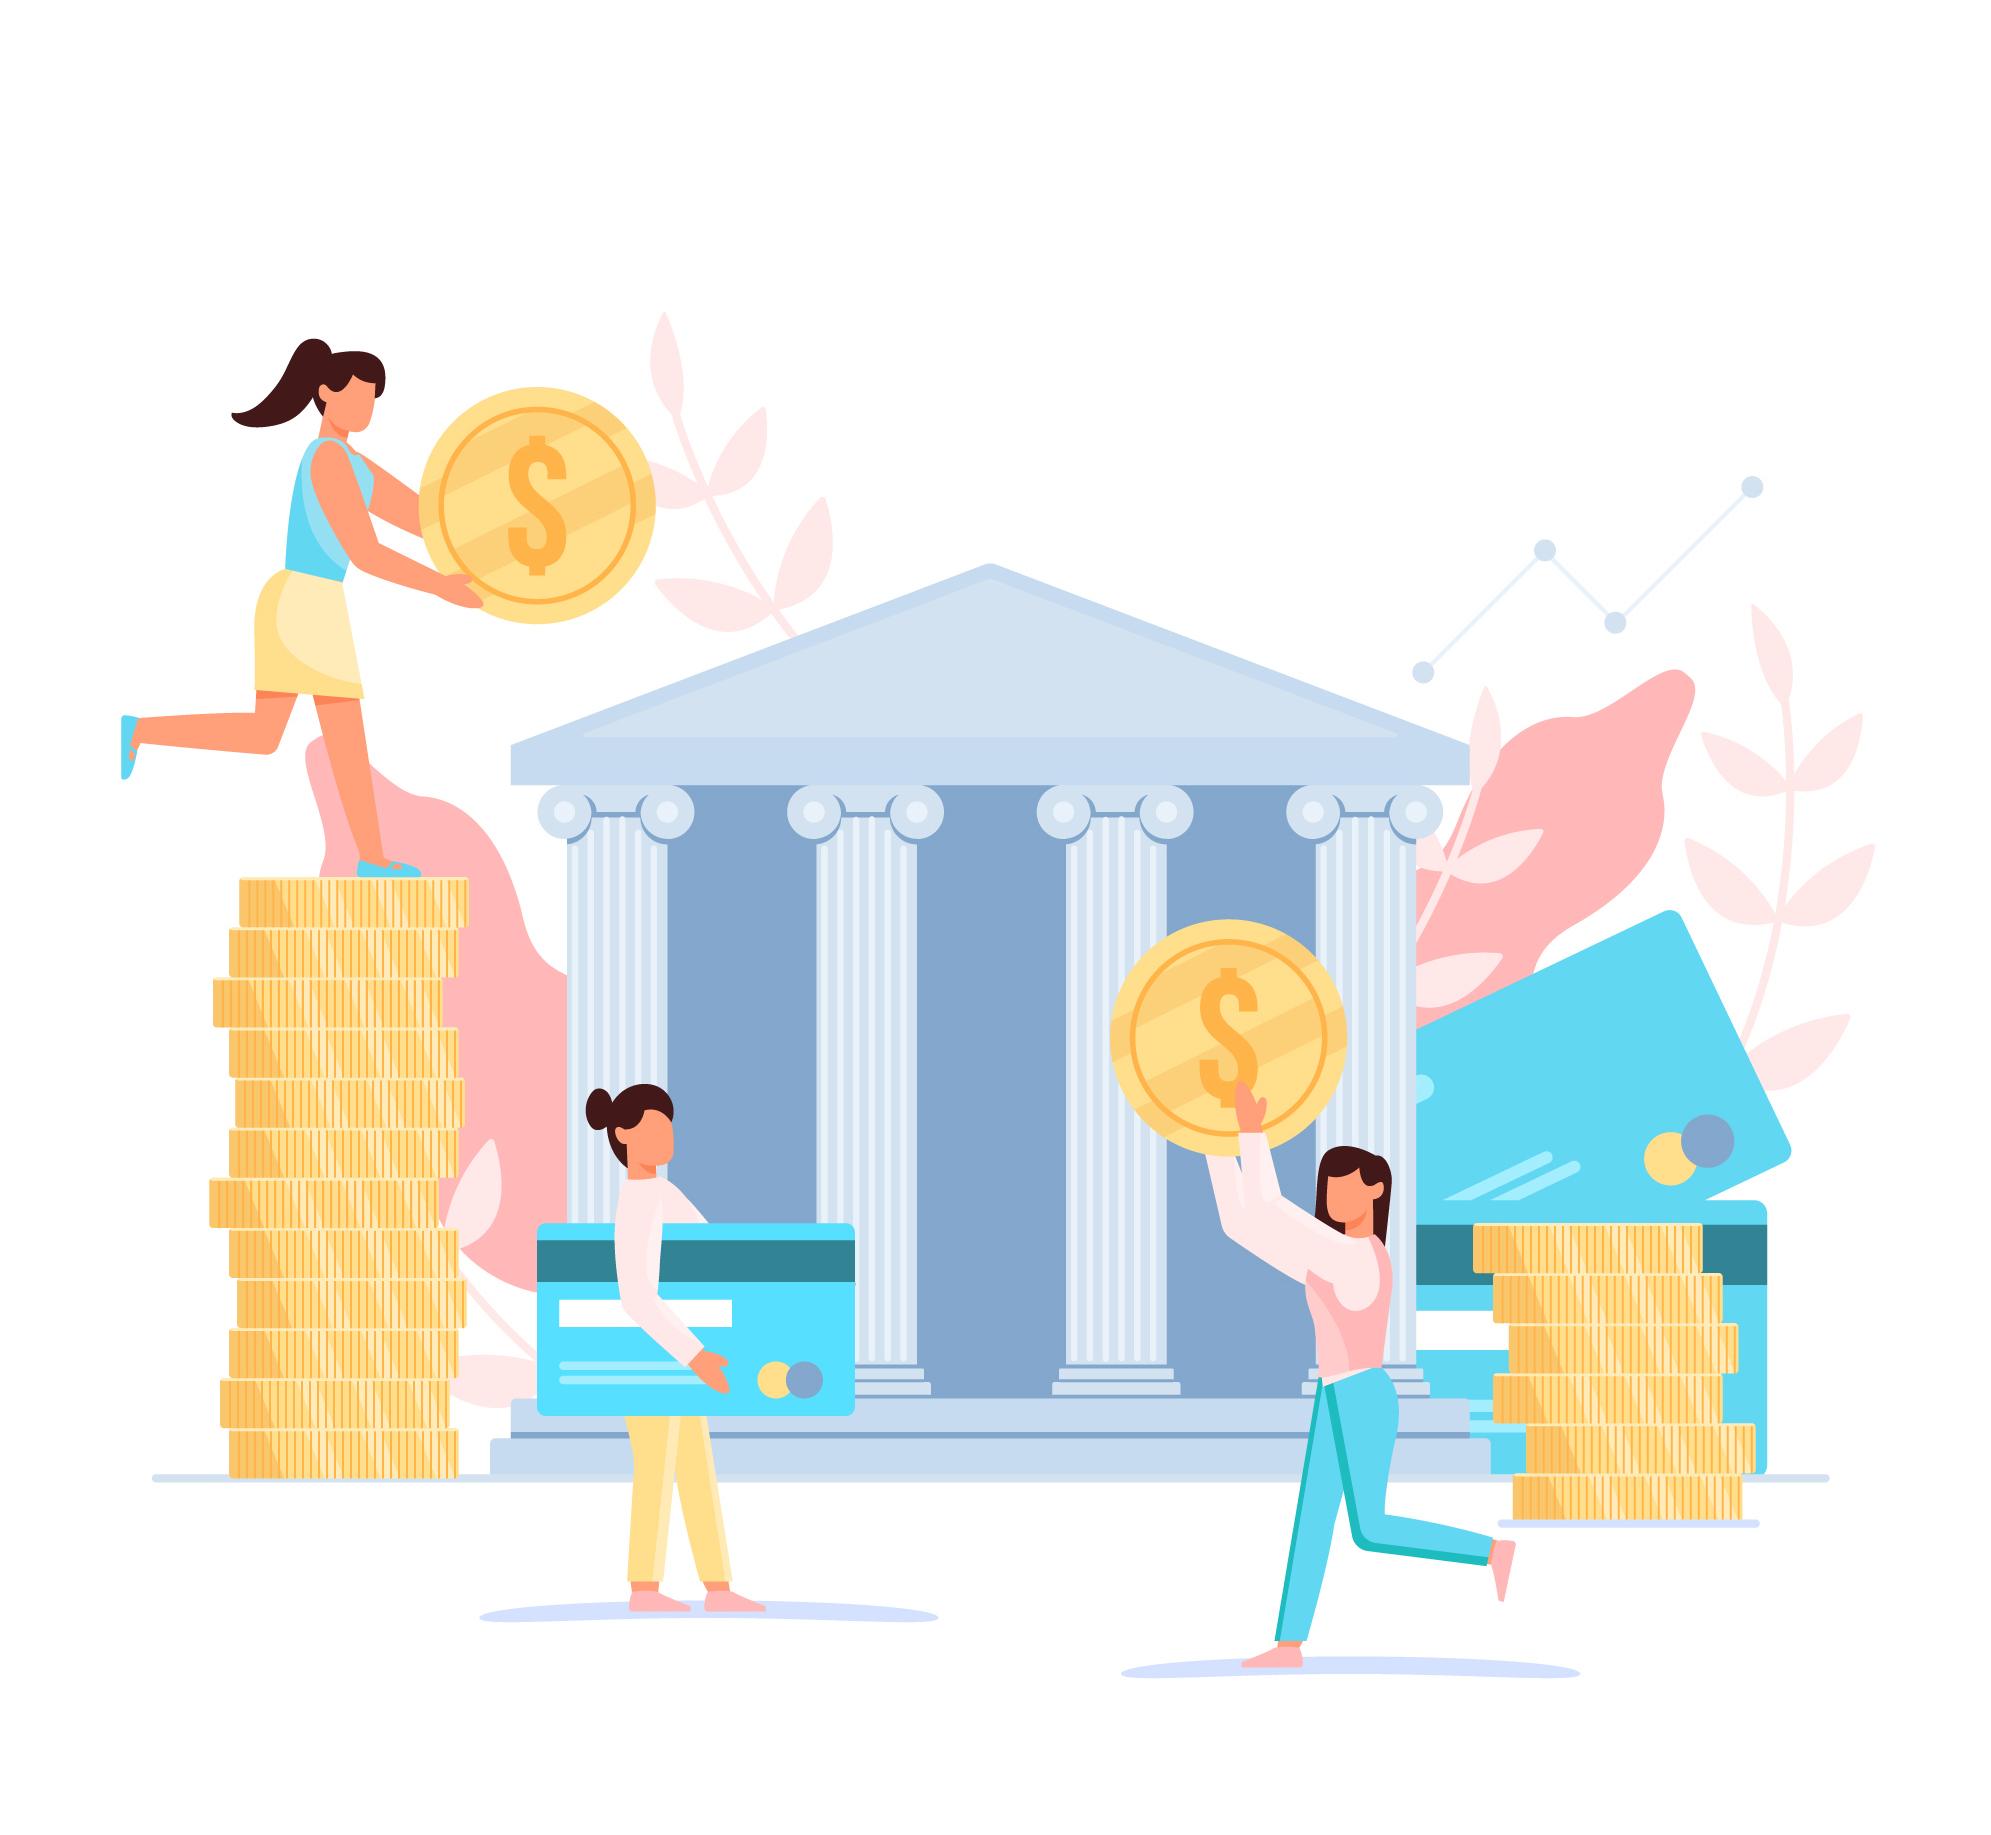 BetaShares Global Banks ETF ASX BNKS